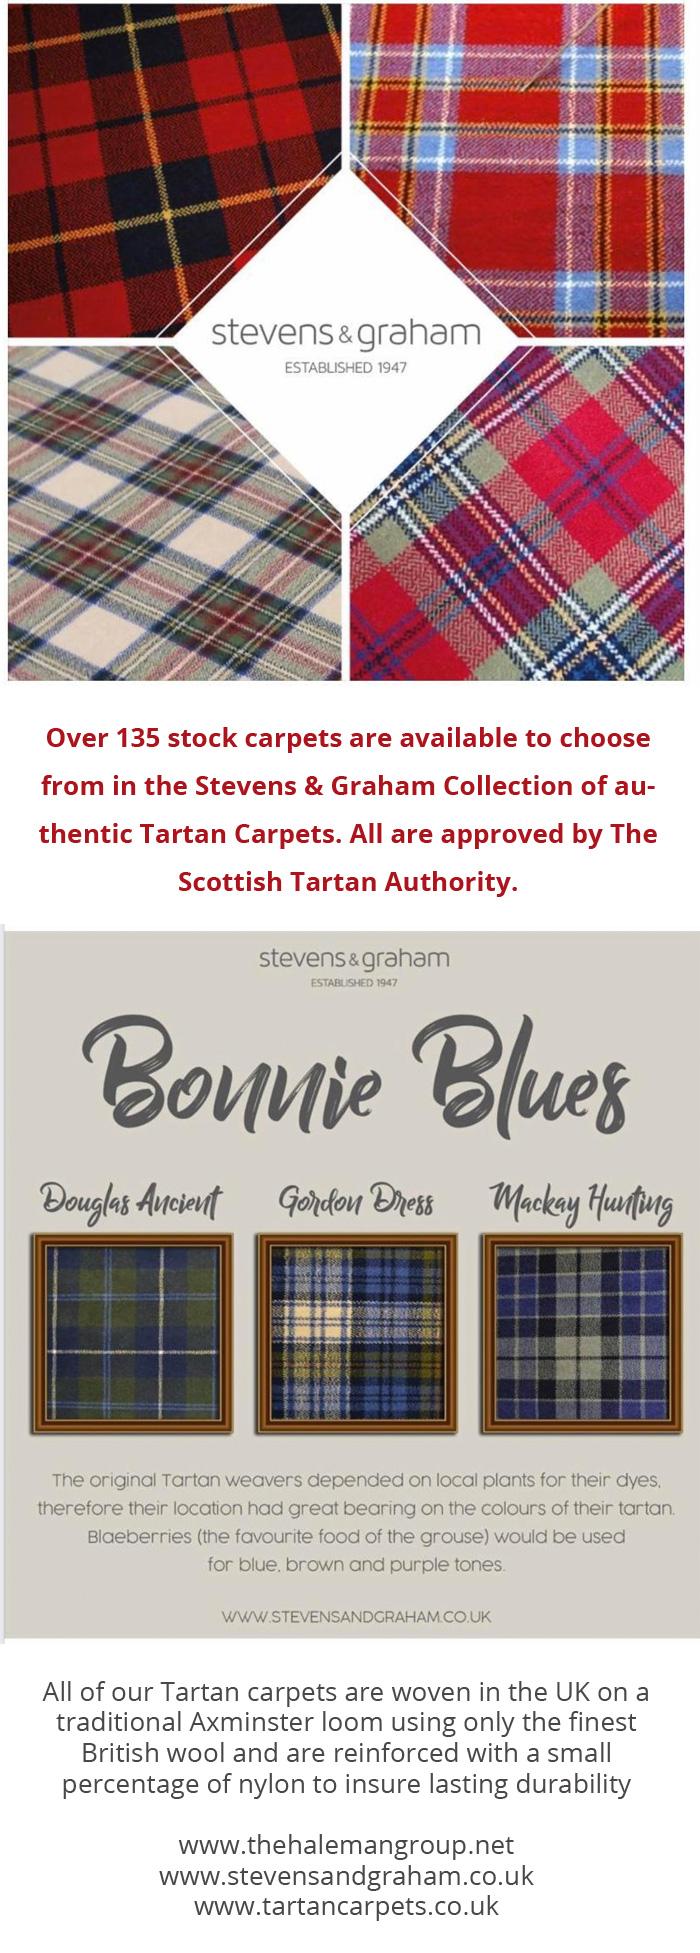 Scottish Tartan Carpets from Stevens & Graham